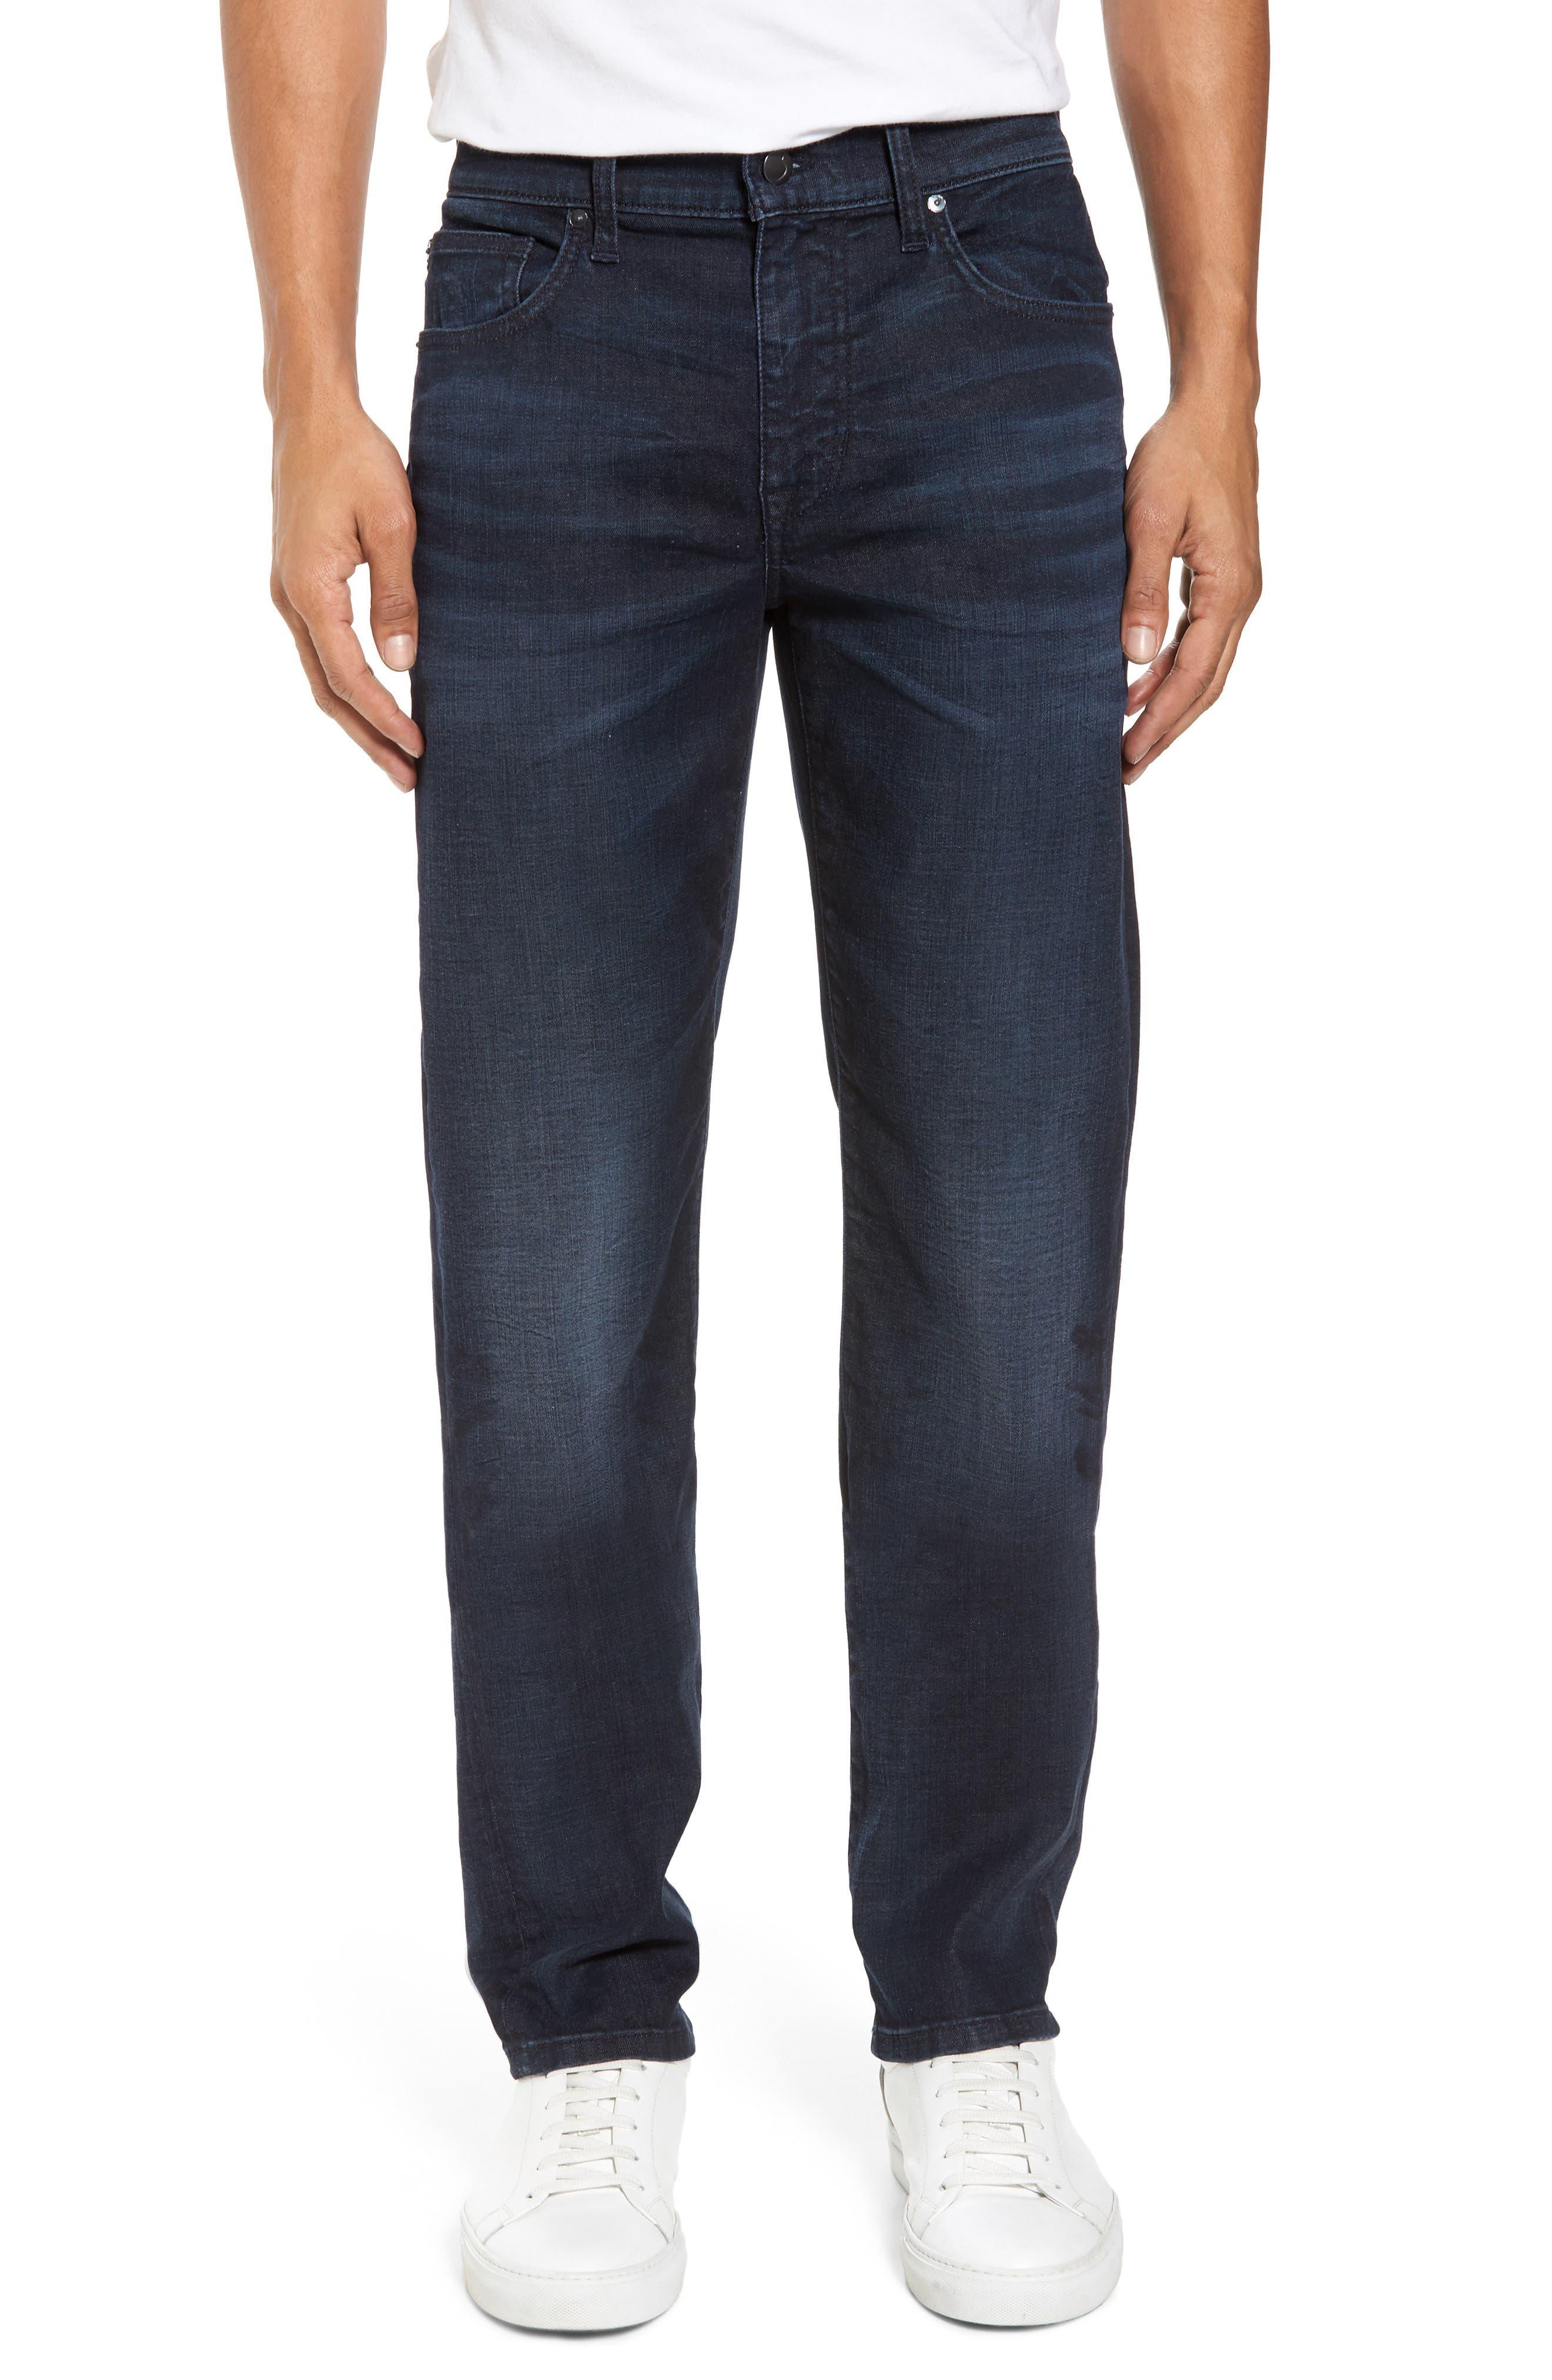 Brixton Slim Straight Leg Jeans,                             Main thumbnail 1, color,                             Larsen